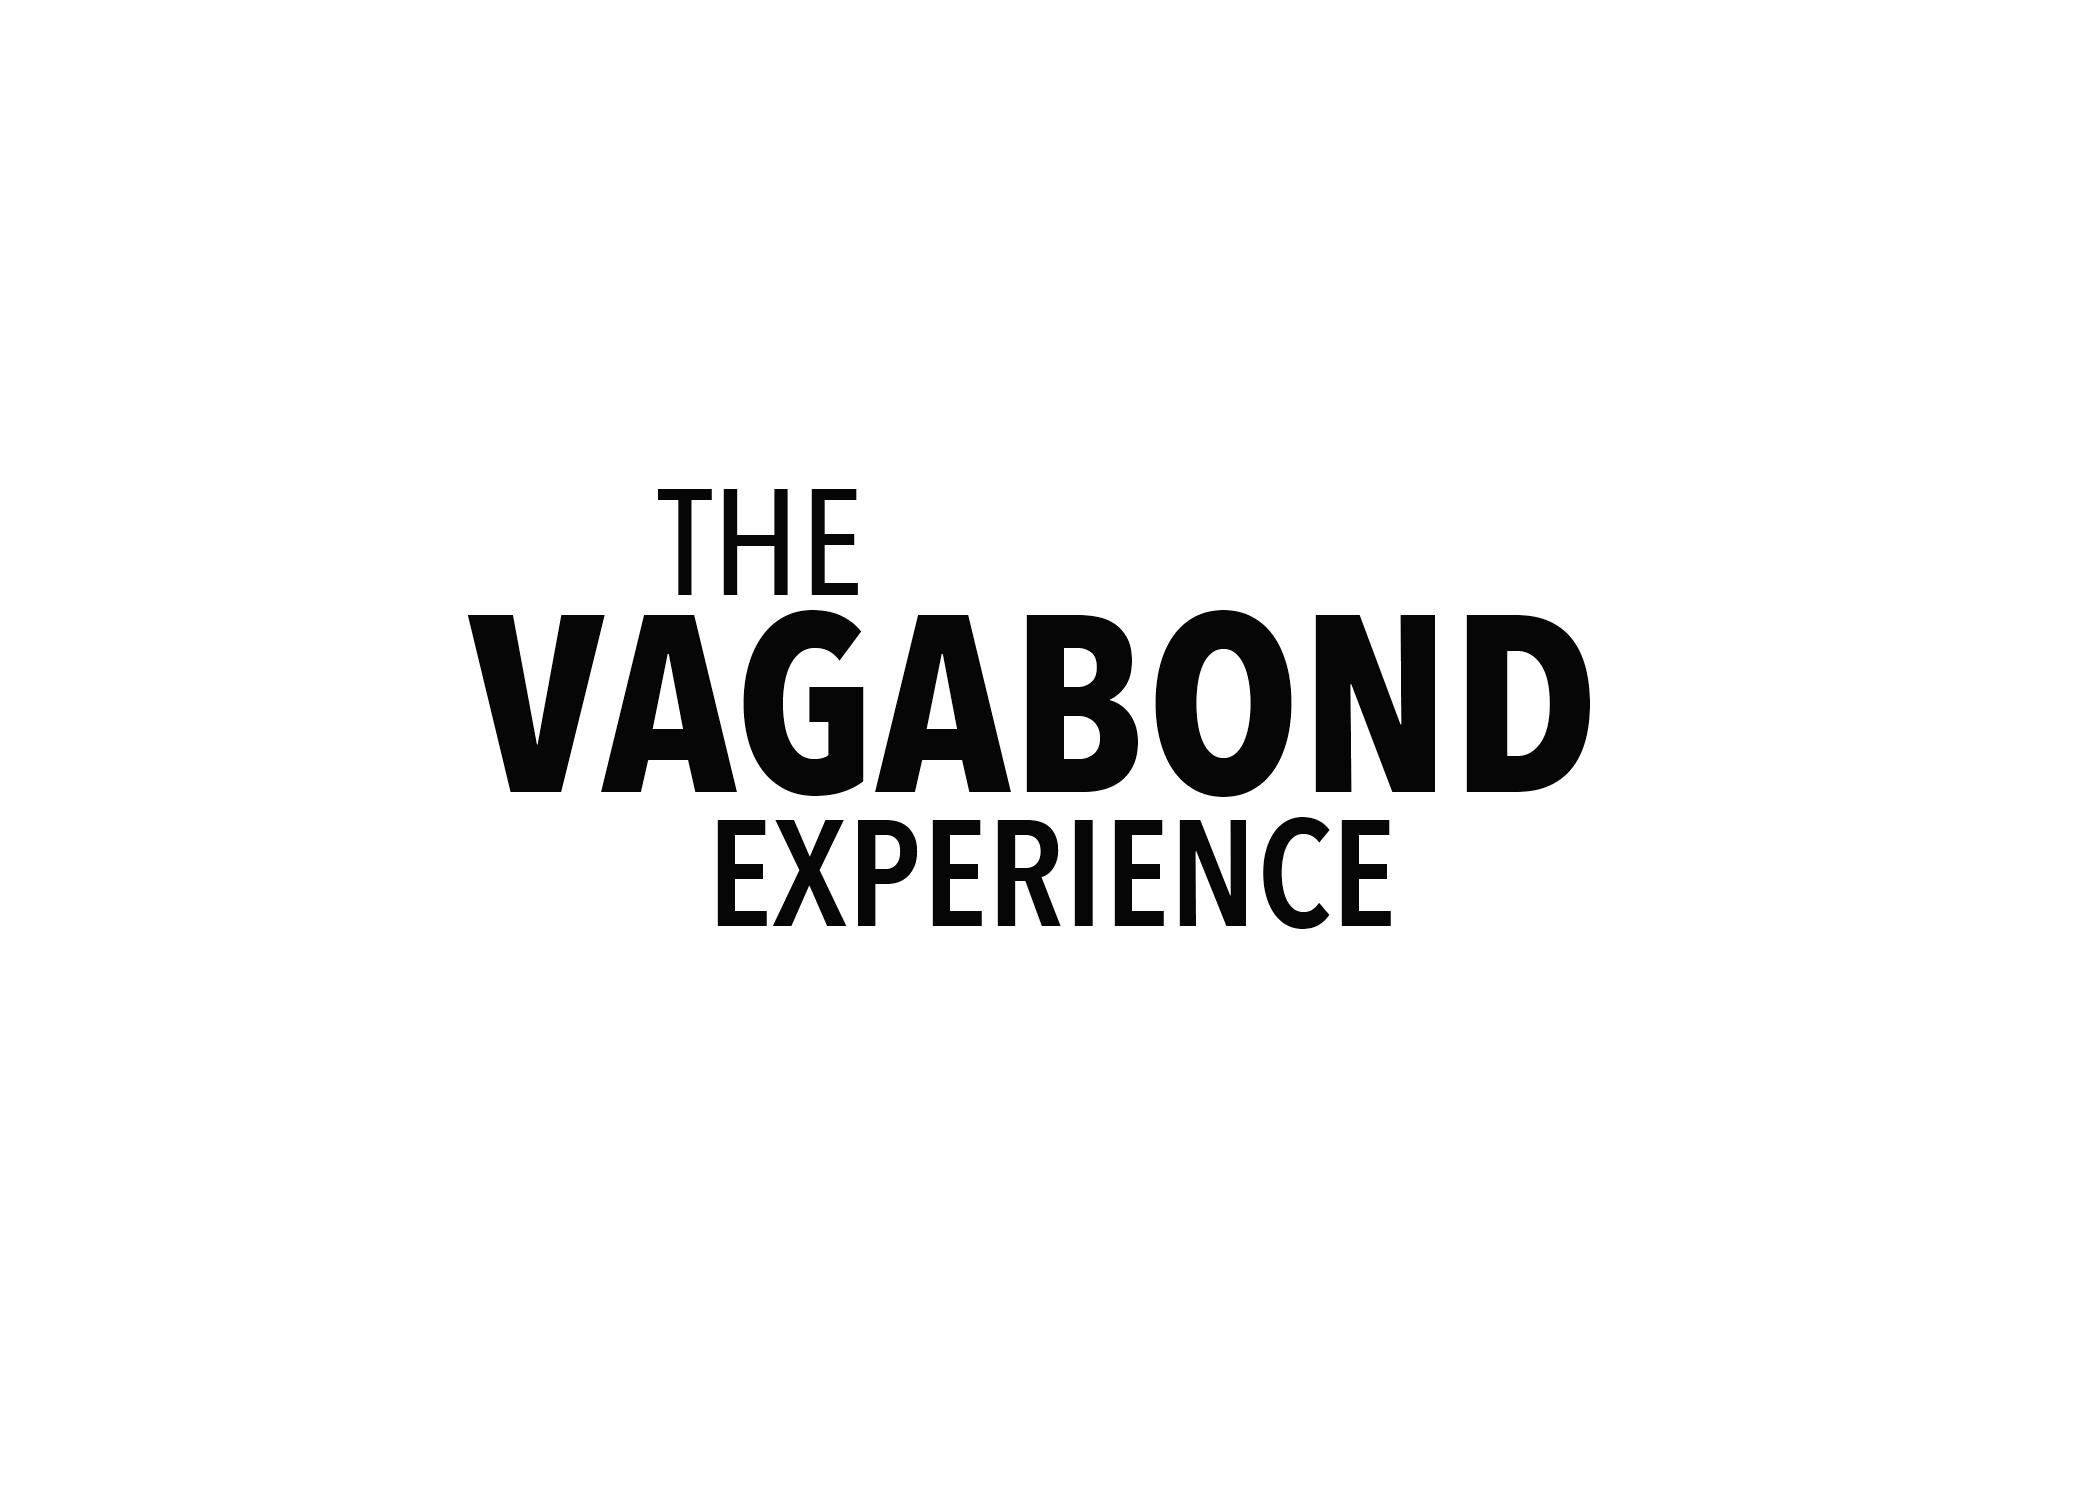 The Vagabond Experience